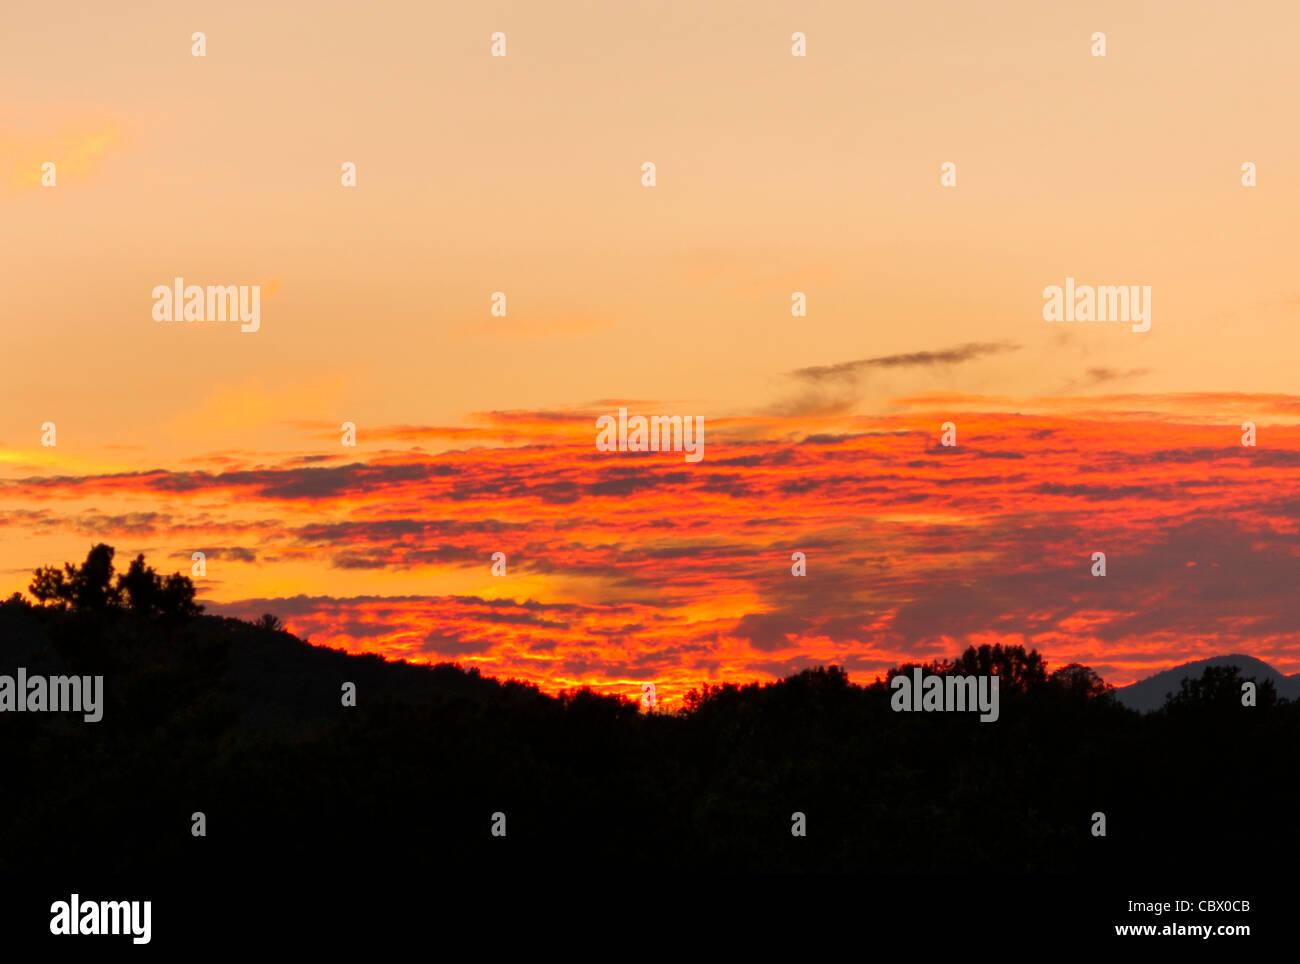 SUNSET CASTLETON VIRGINIA USA - Stock Image